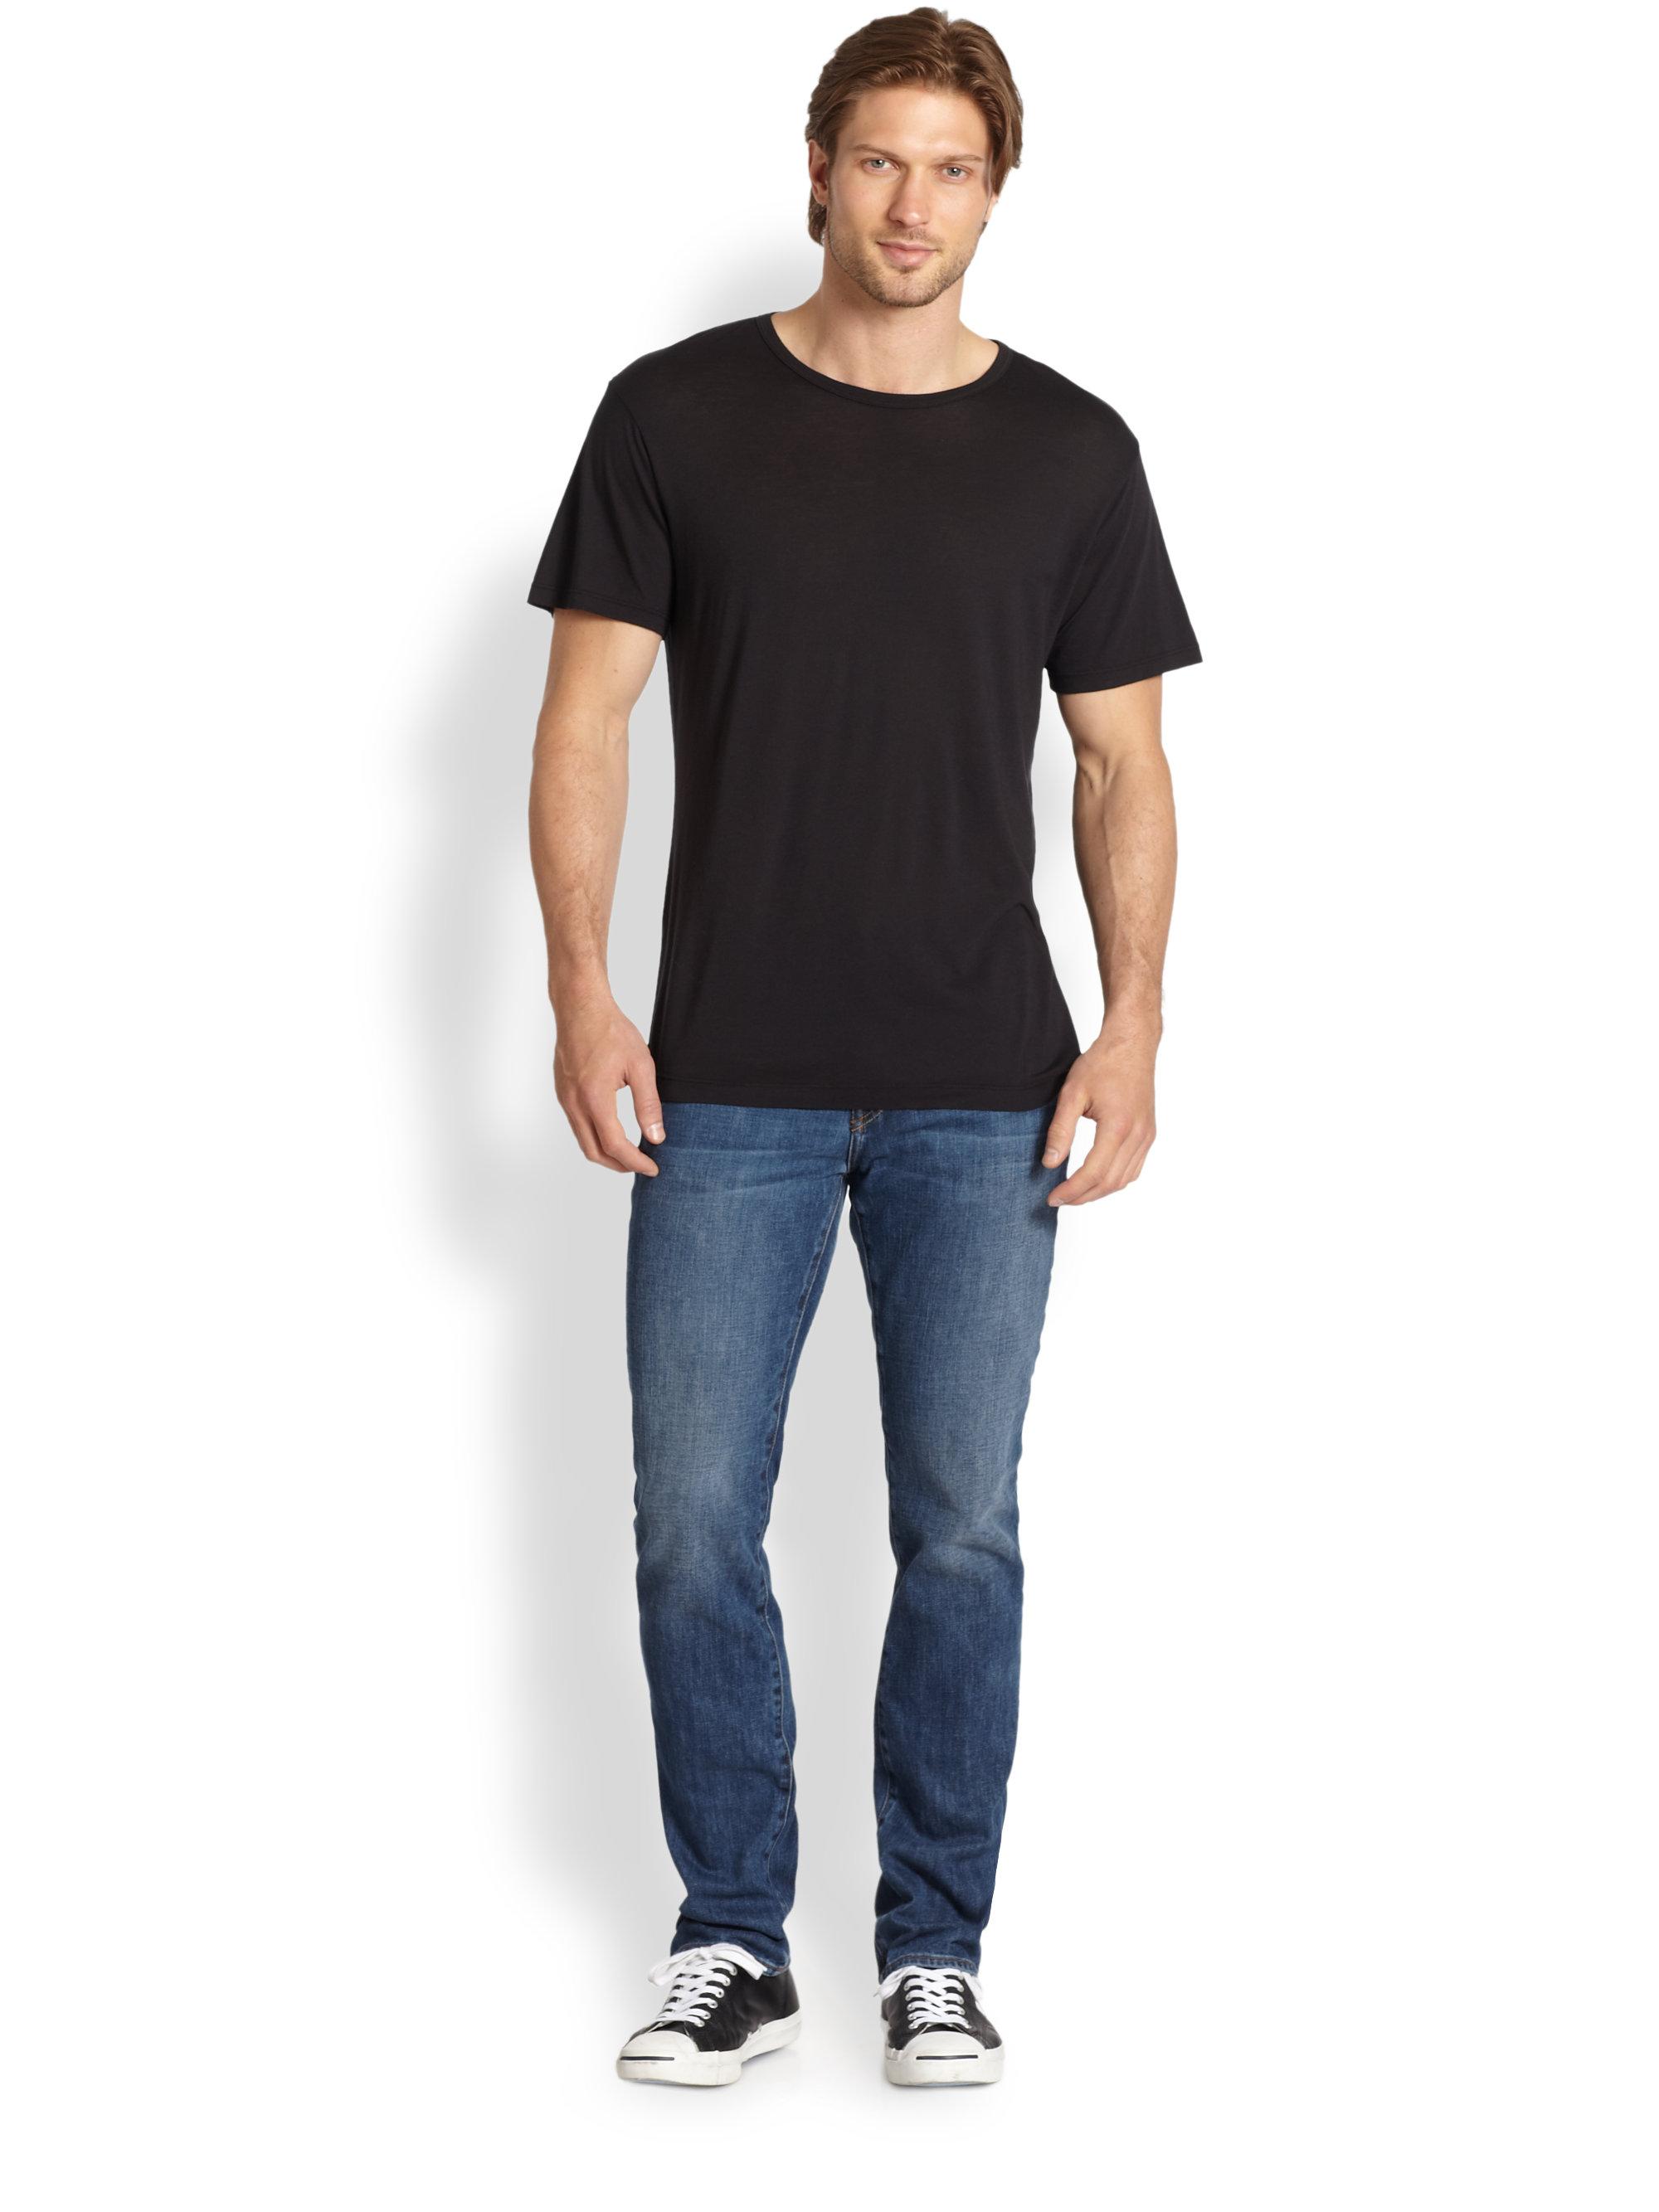 Halcyon Brand Clothing